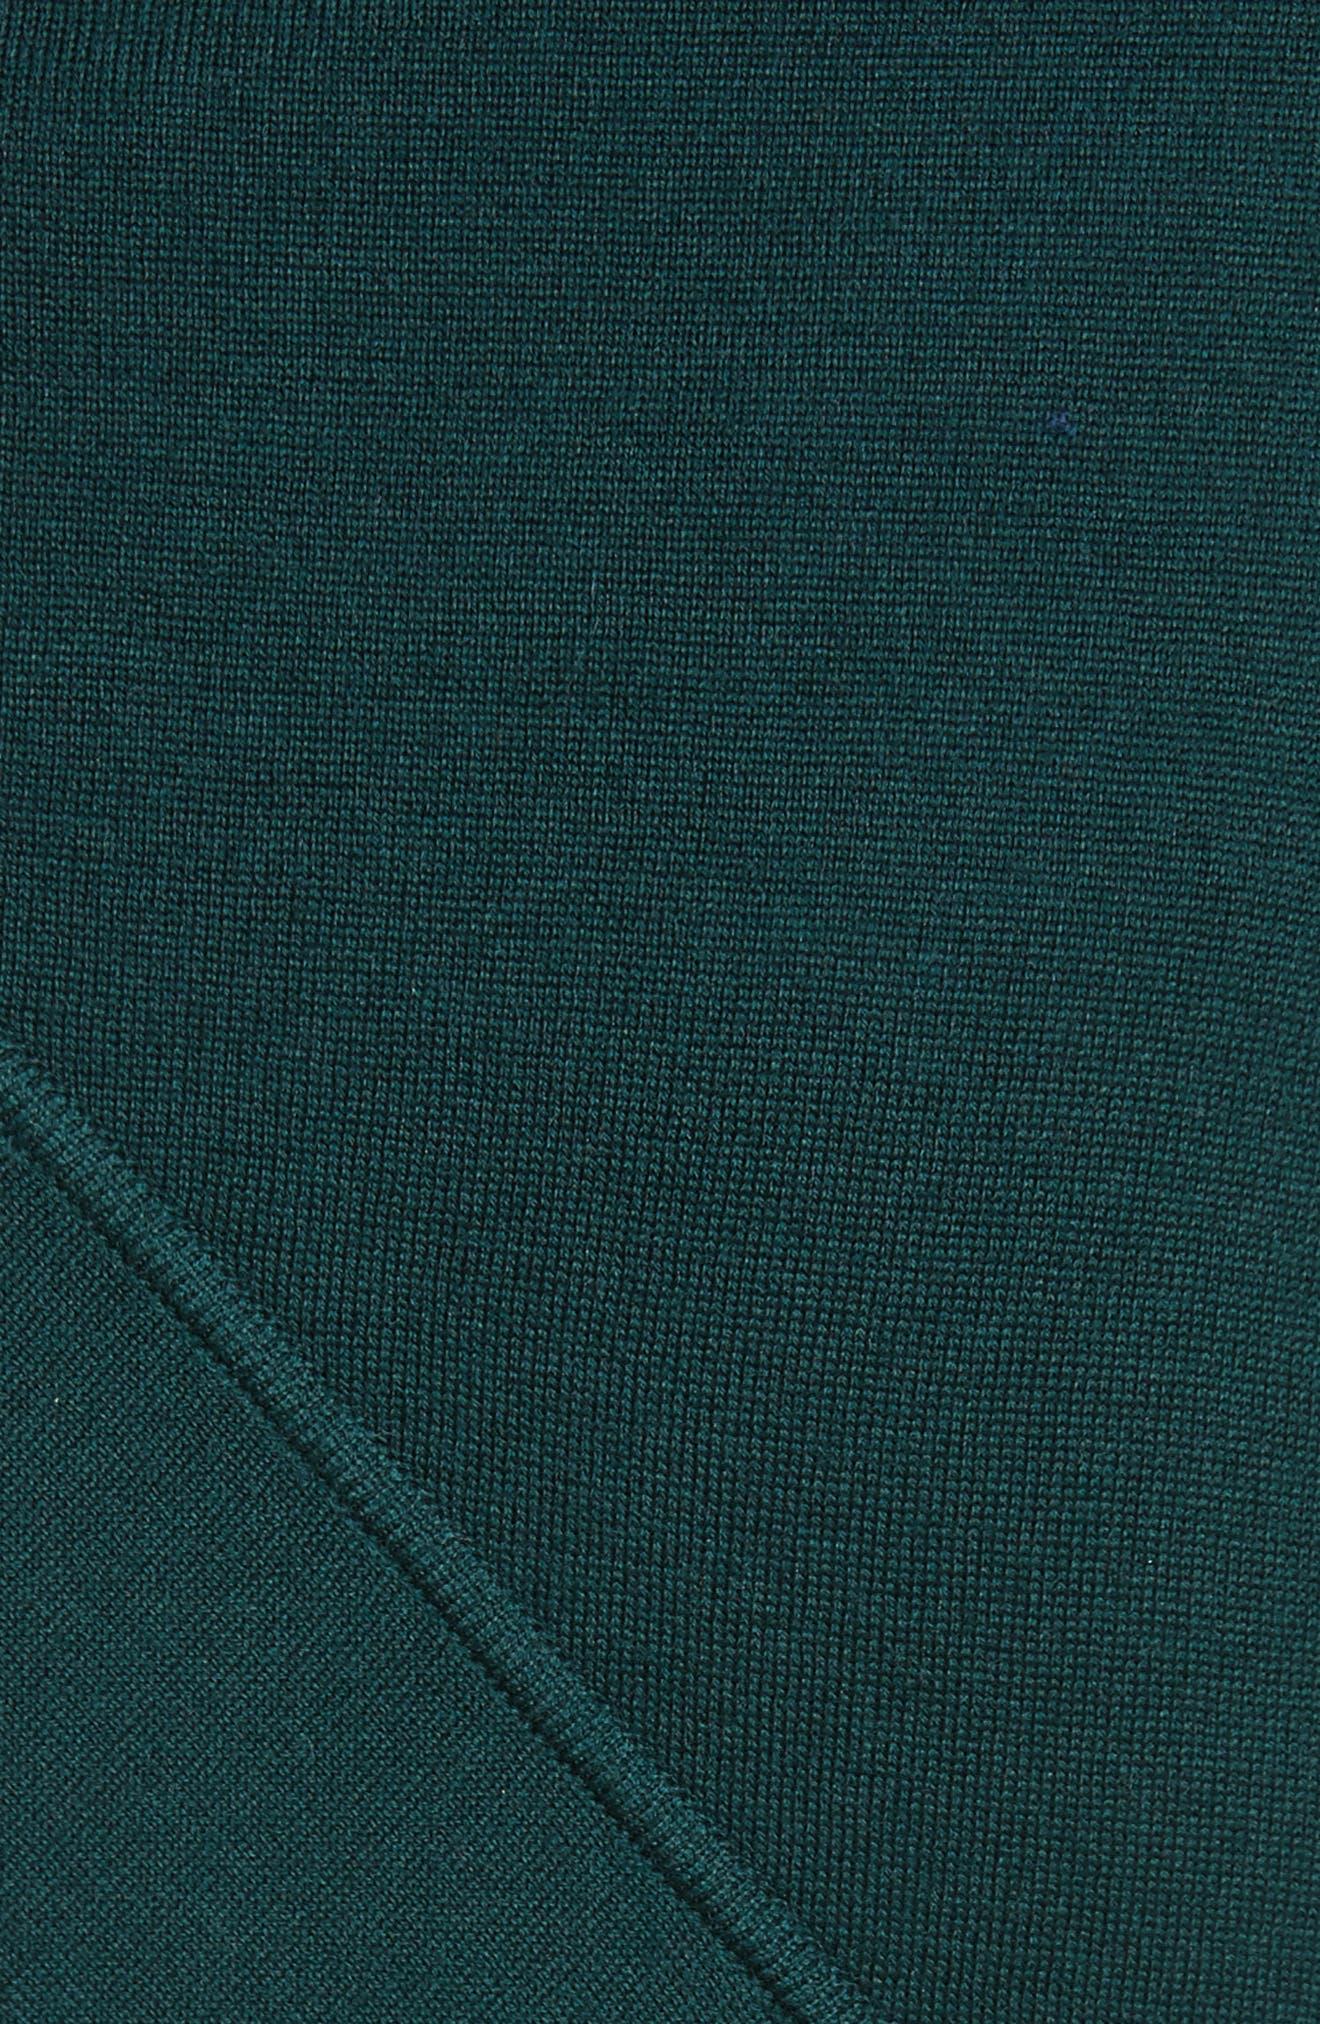 Reversible Asymmetrical Knit Midi Skirt,                             Alternate thumbnail 8, color,                             Ivy/ Lapis